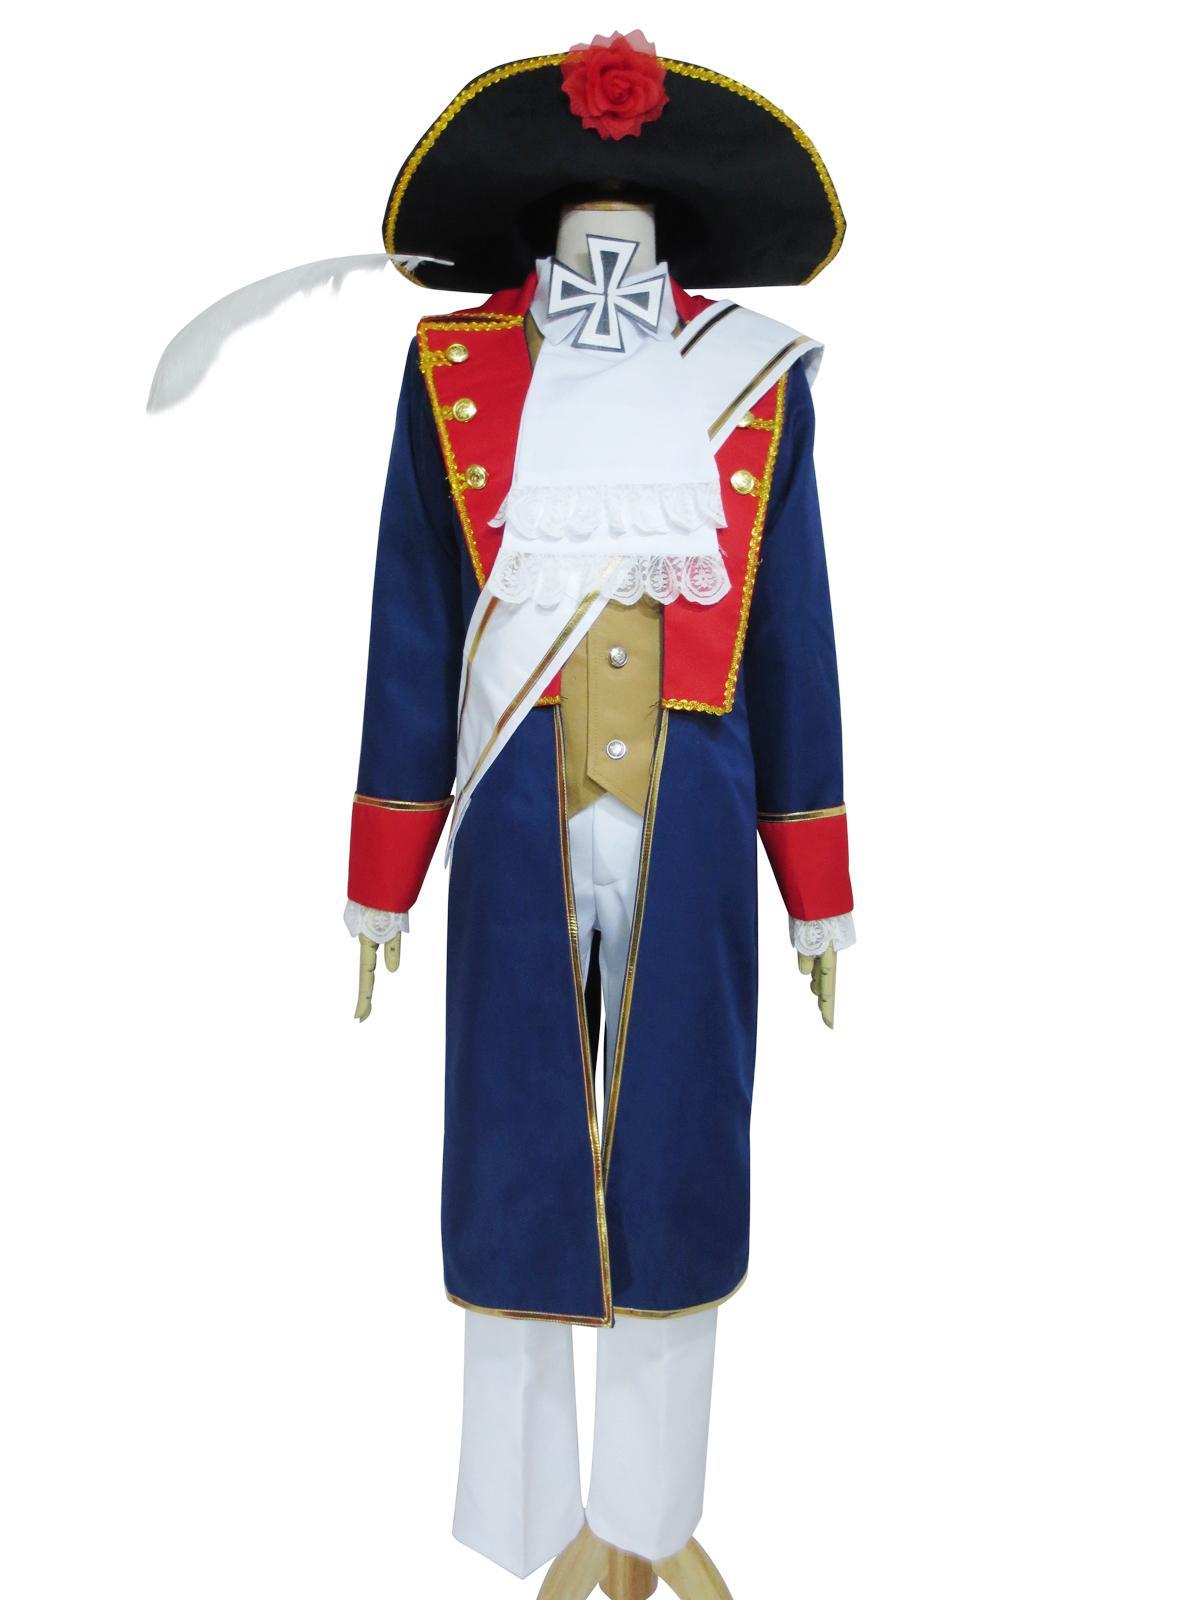 Axis Powers Hetalia Prussia Halloween Uniform Set With Hat Cosplay Costume